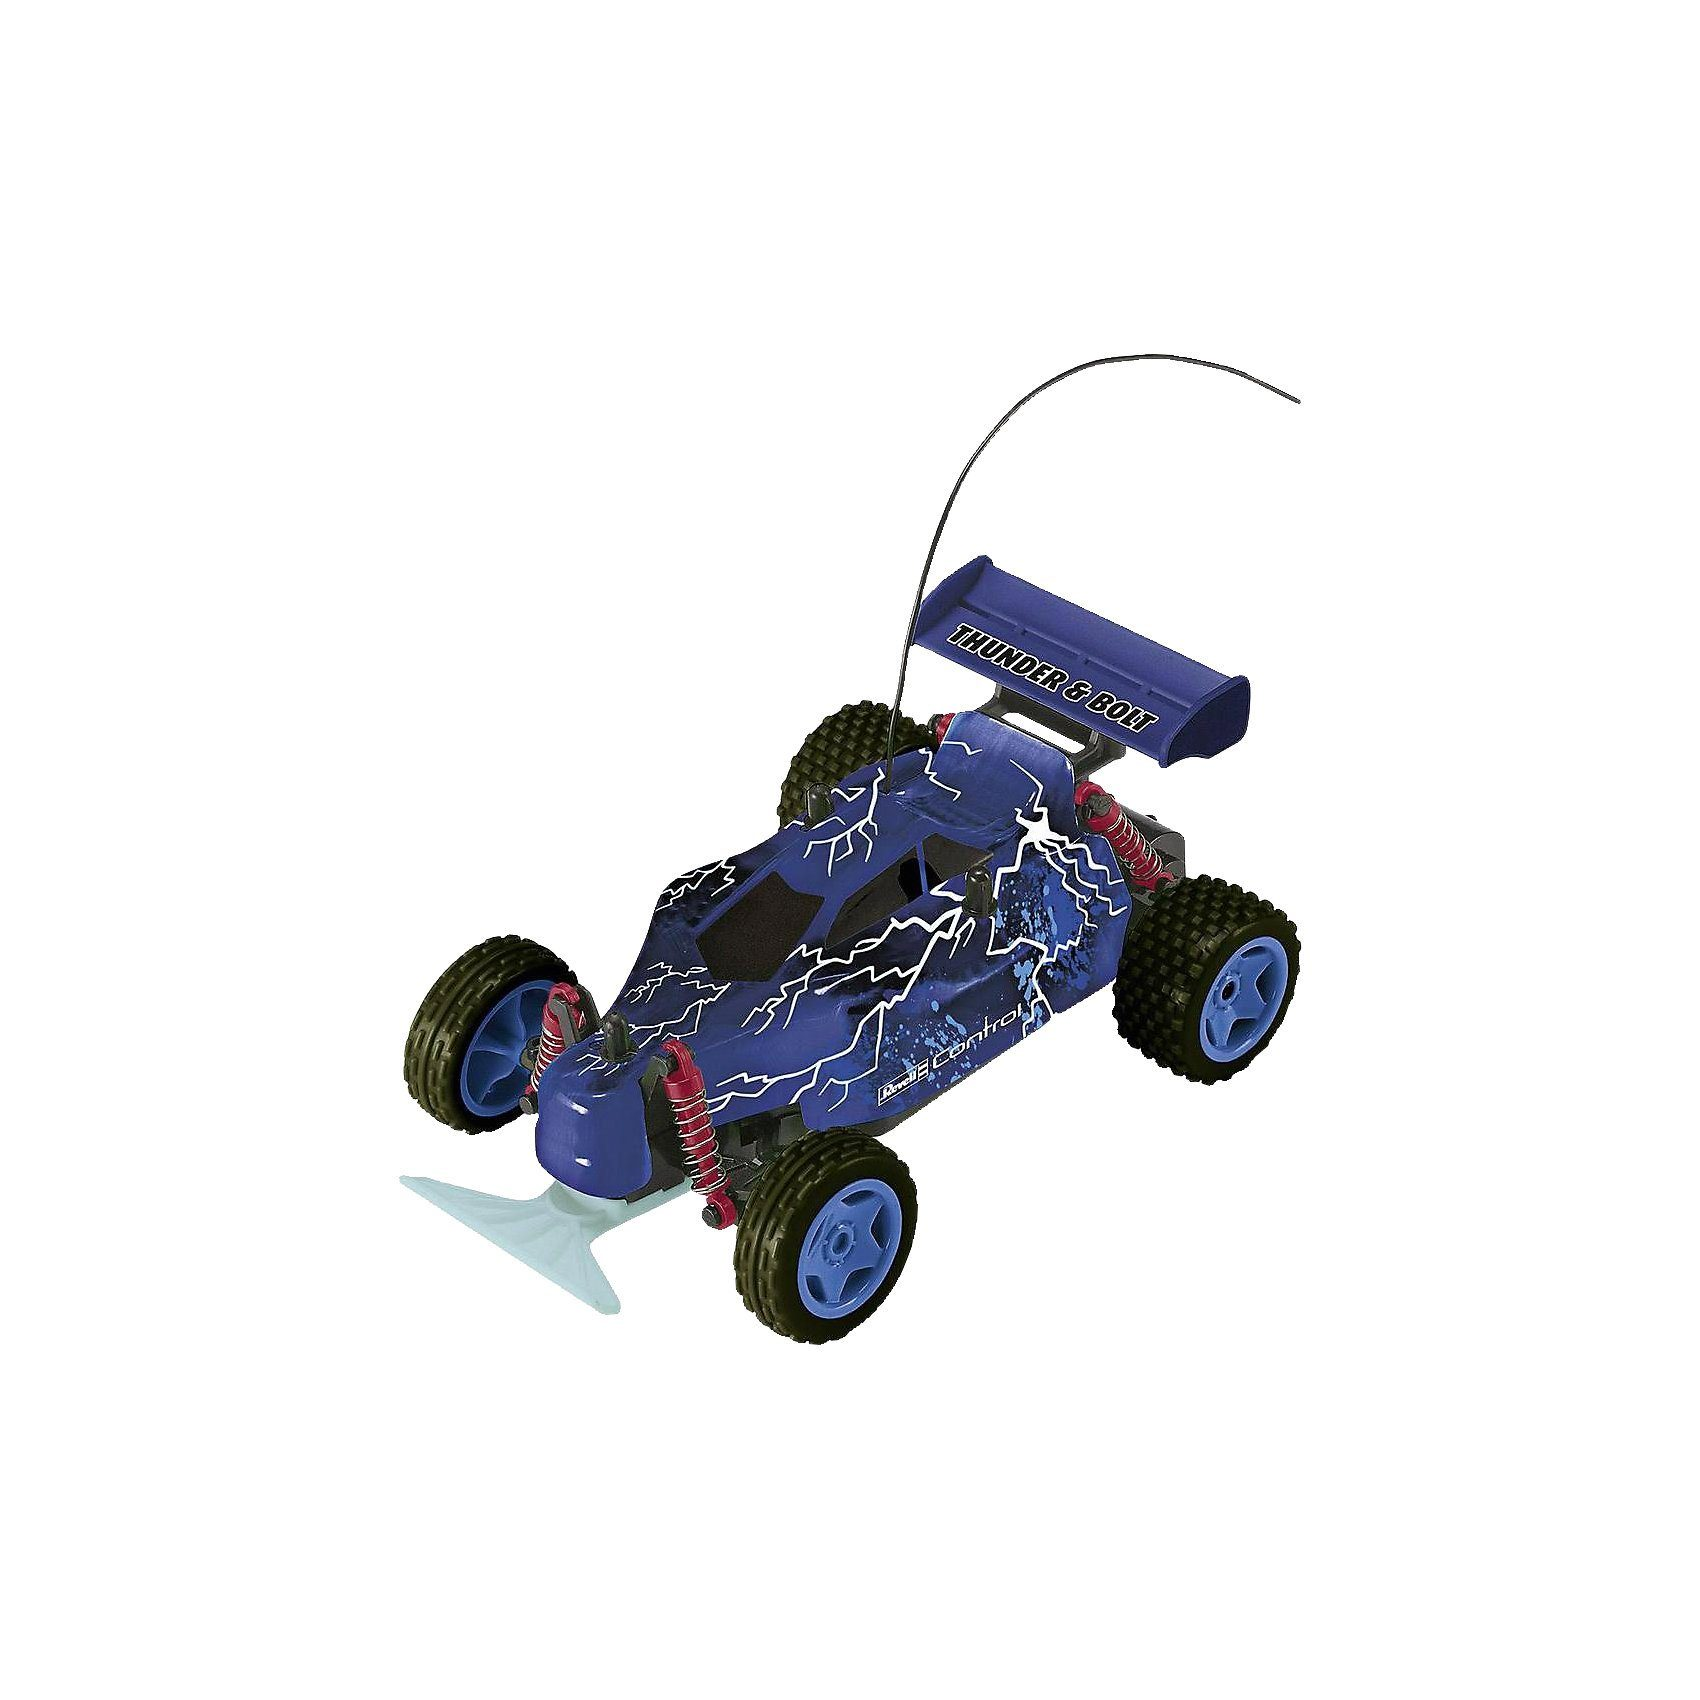 Revell Control Buggy Thunder & Bolt